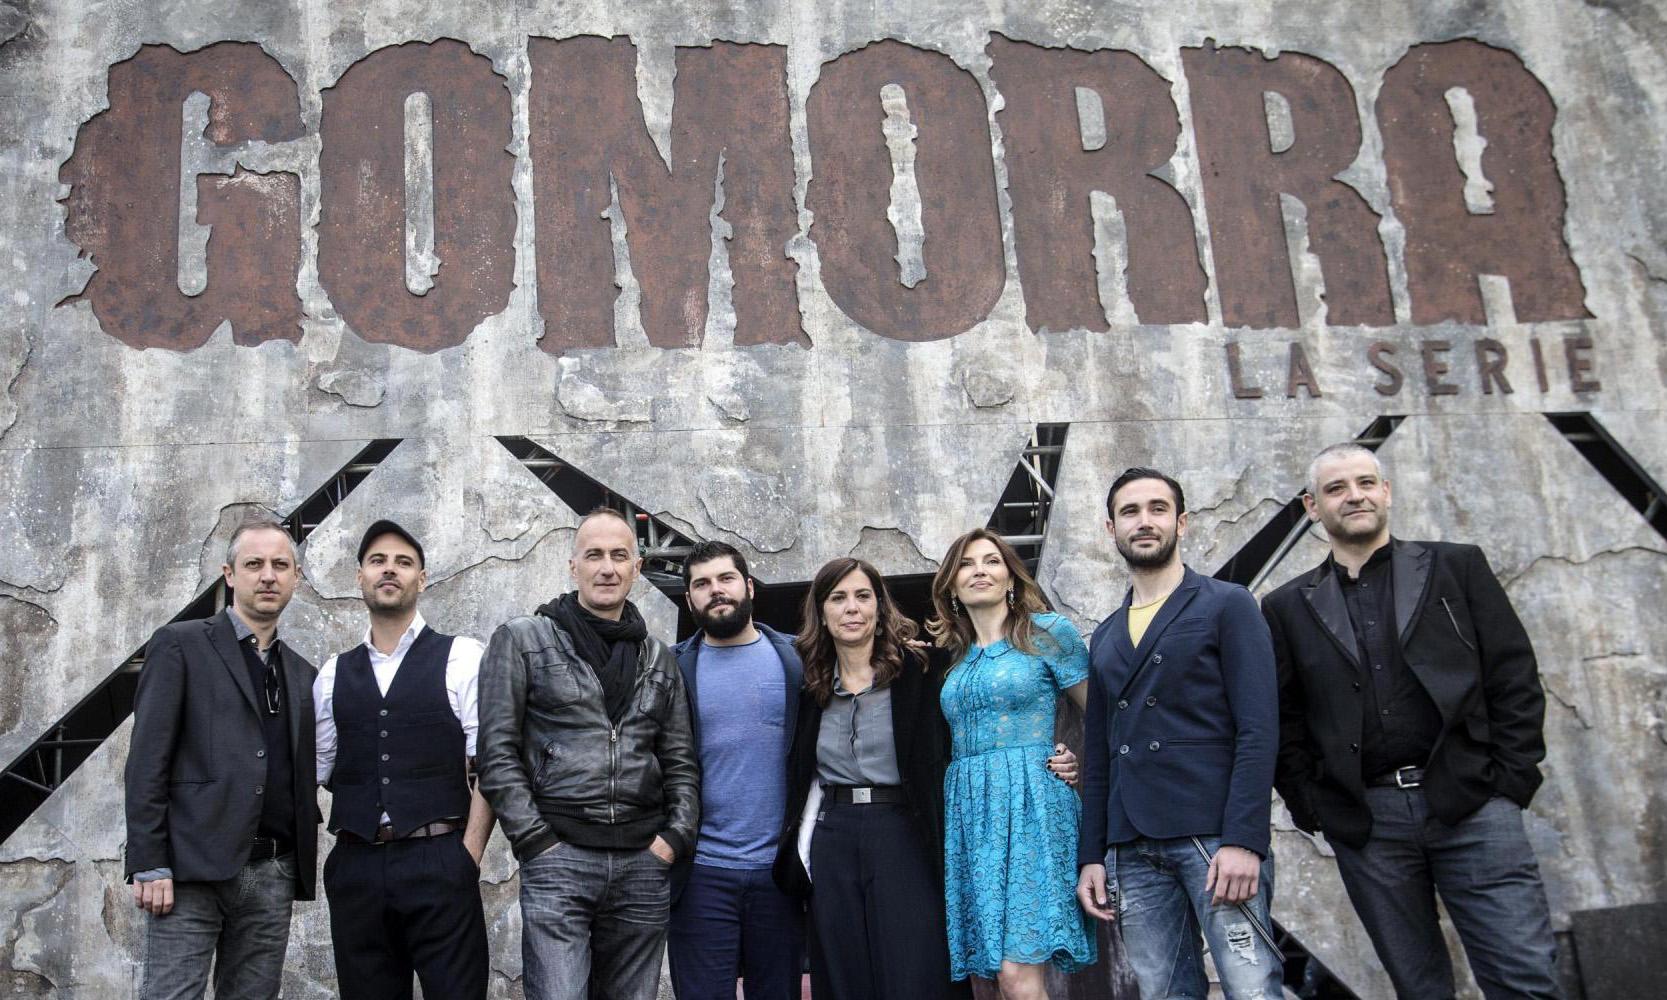 Italy Bribesville TV drama seeks to emulate Gomorra success